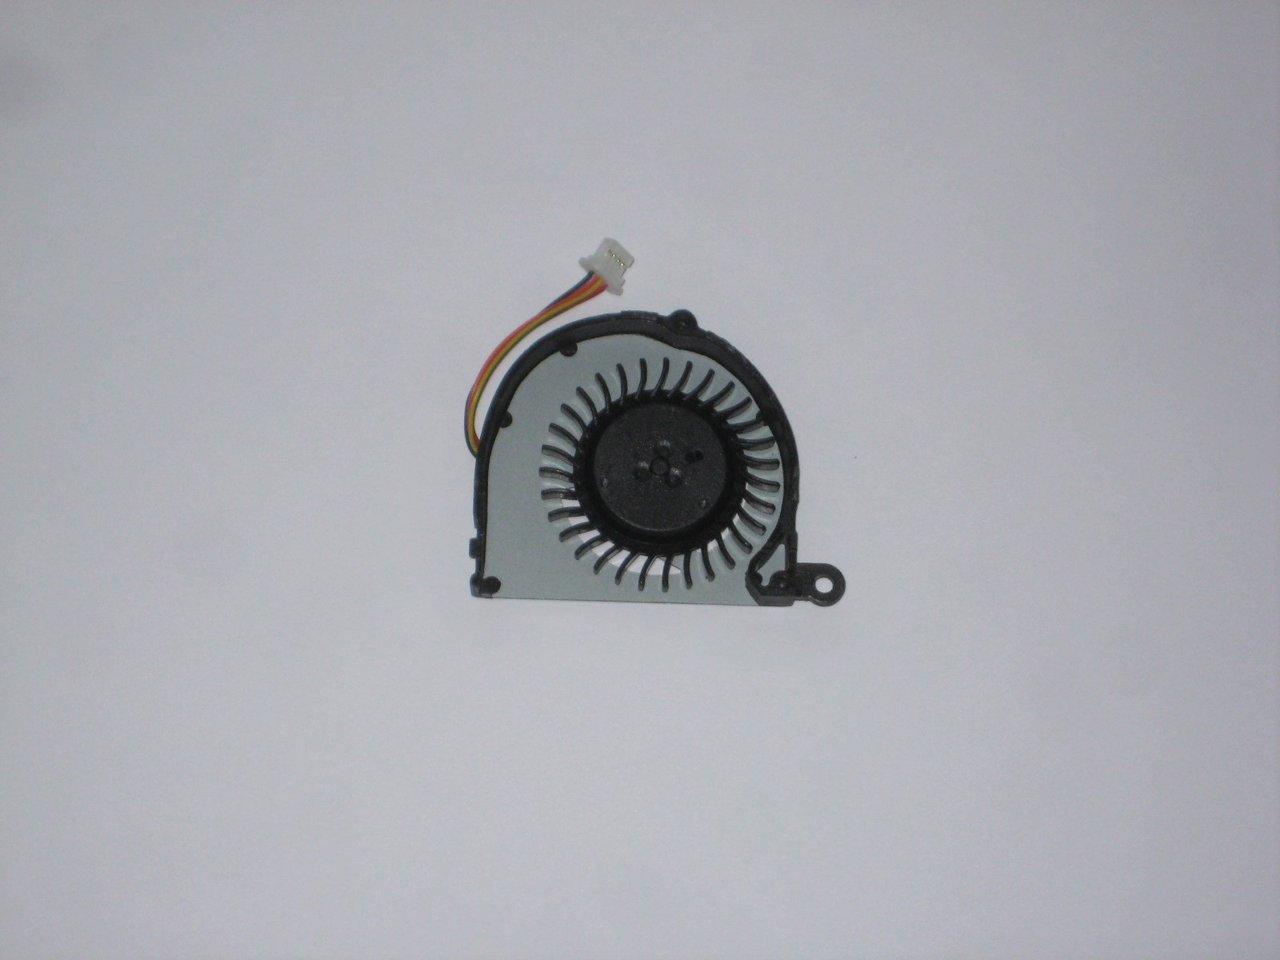 Delta KSB0405HB-AE38 Kühler Lüfter für ASUS EEE PC Netbook